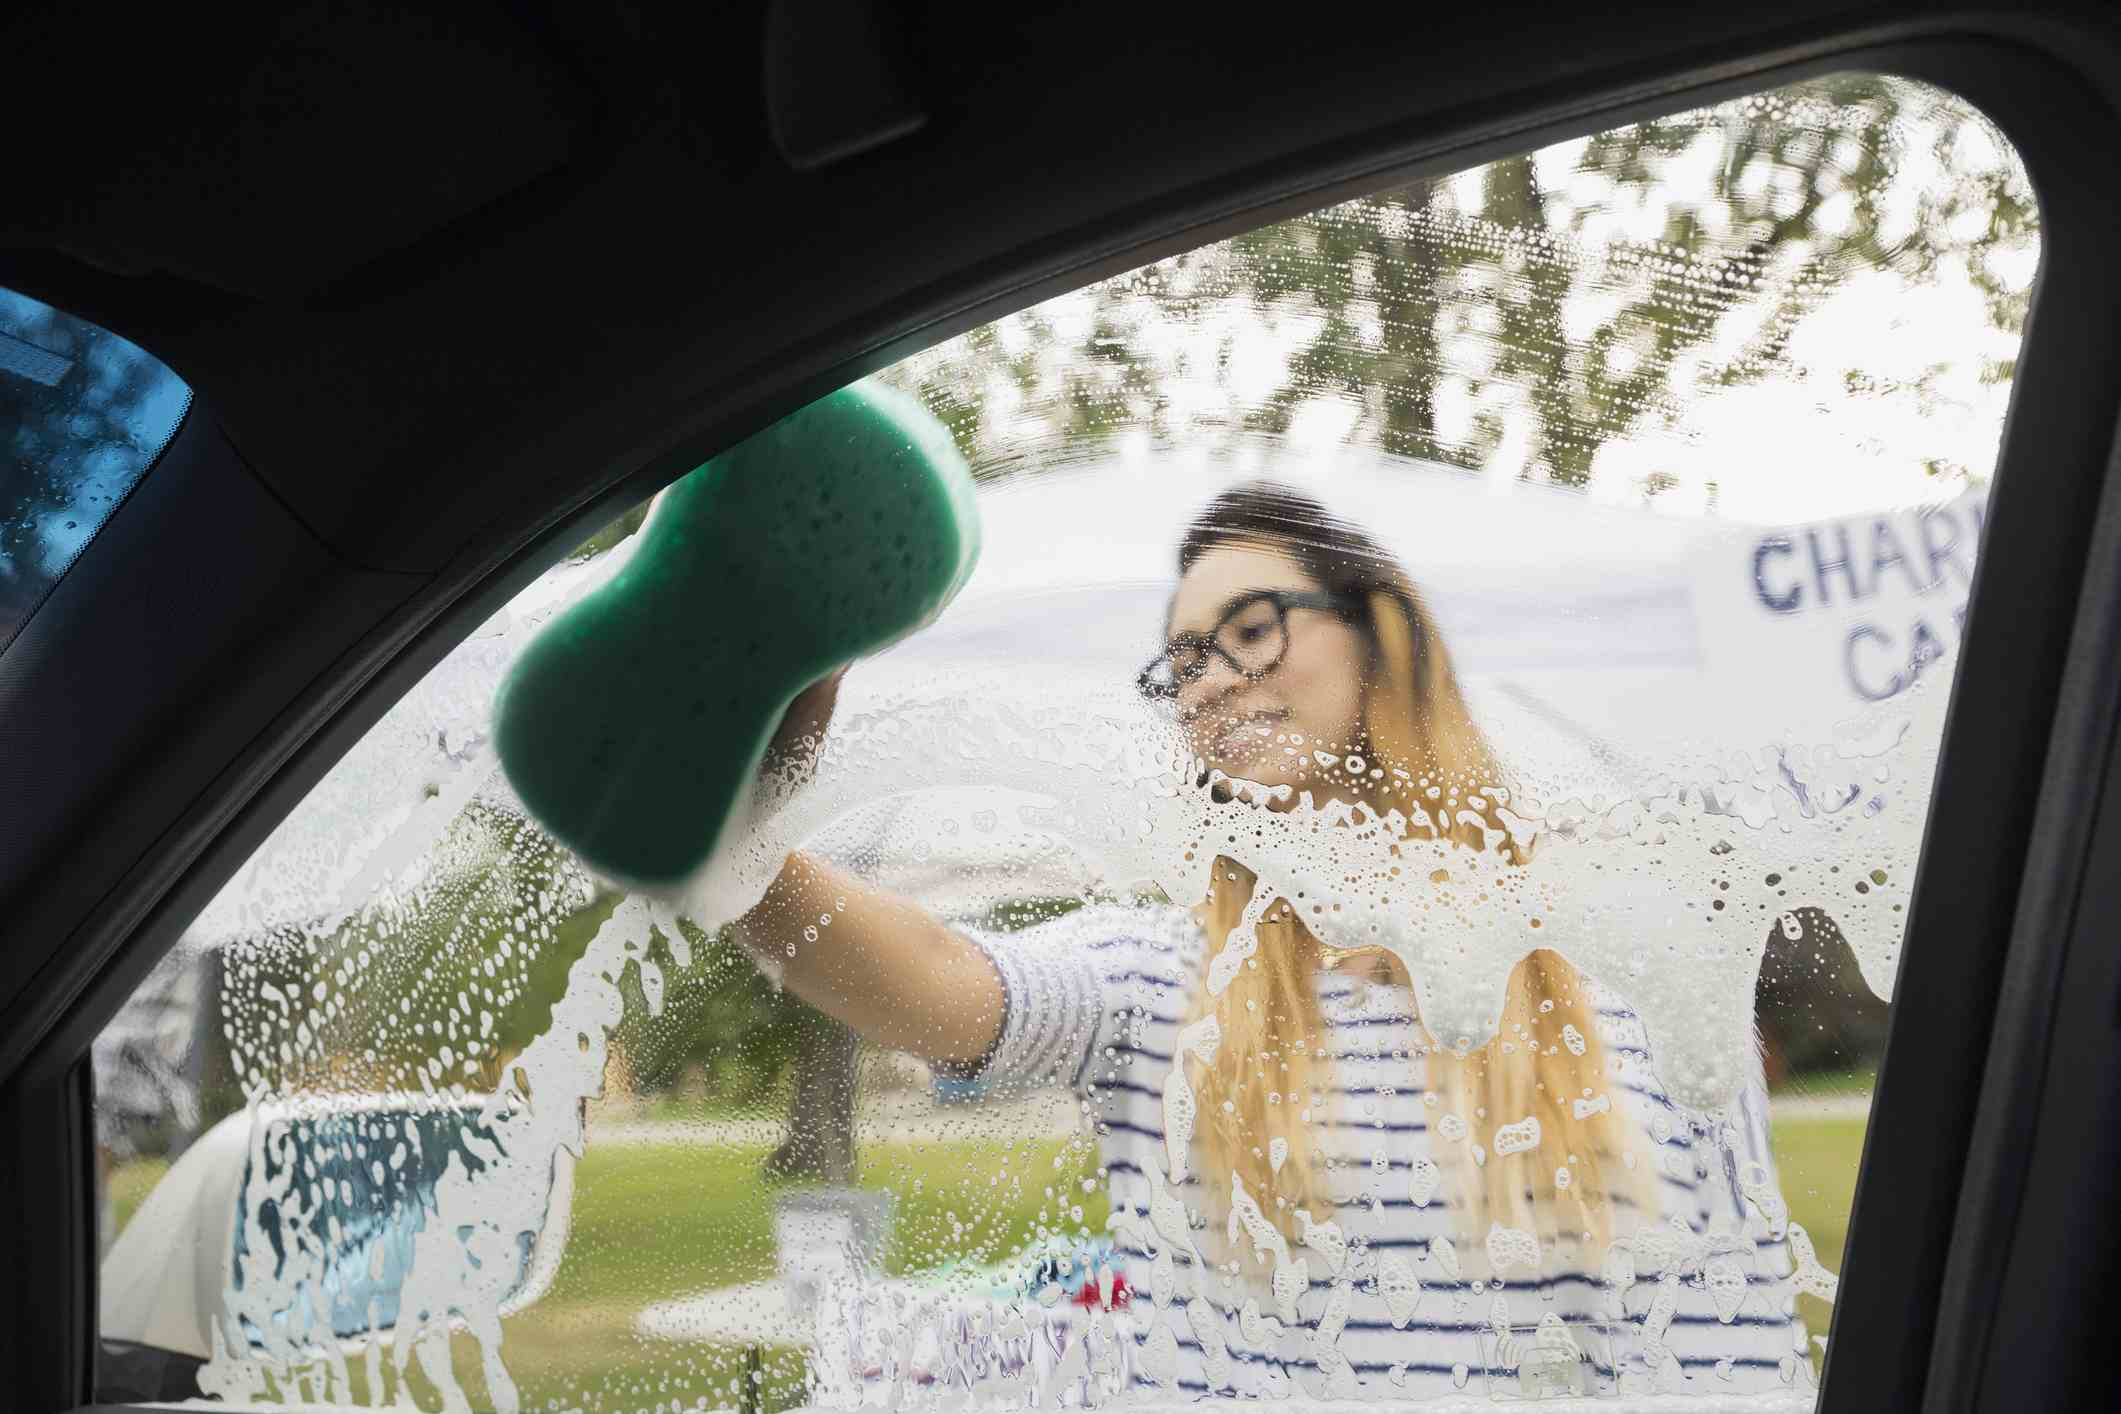 person using a sponge on a car window